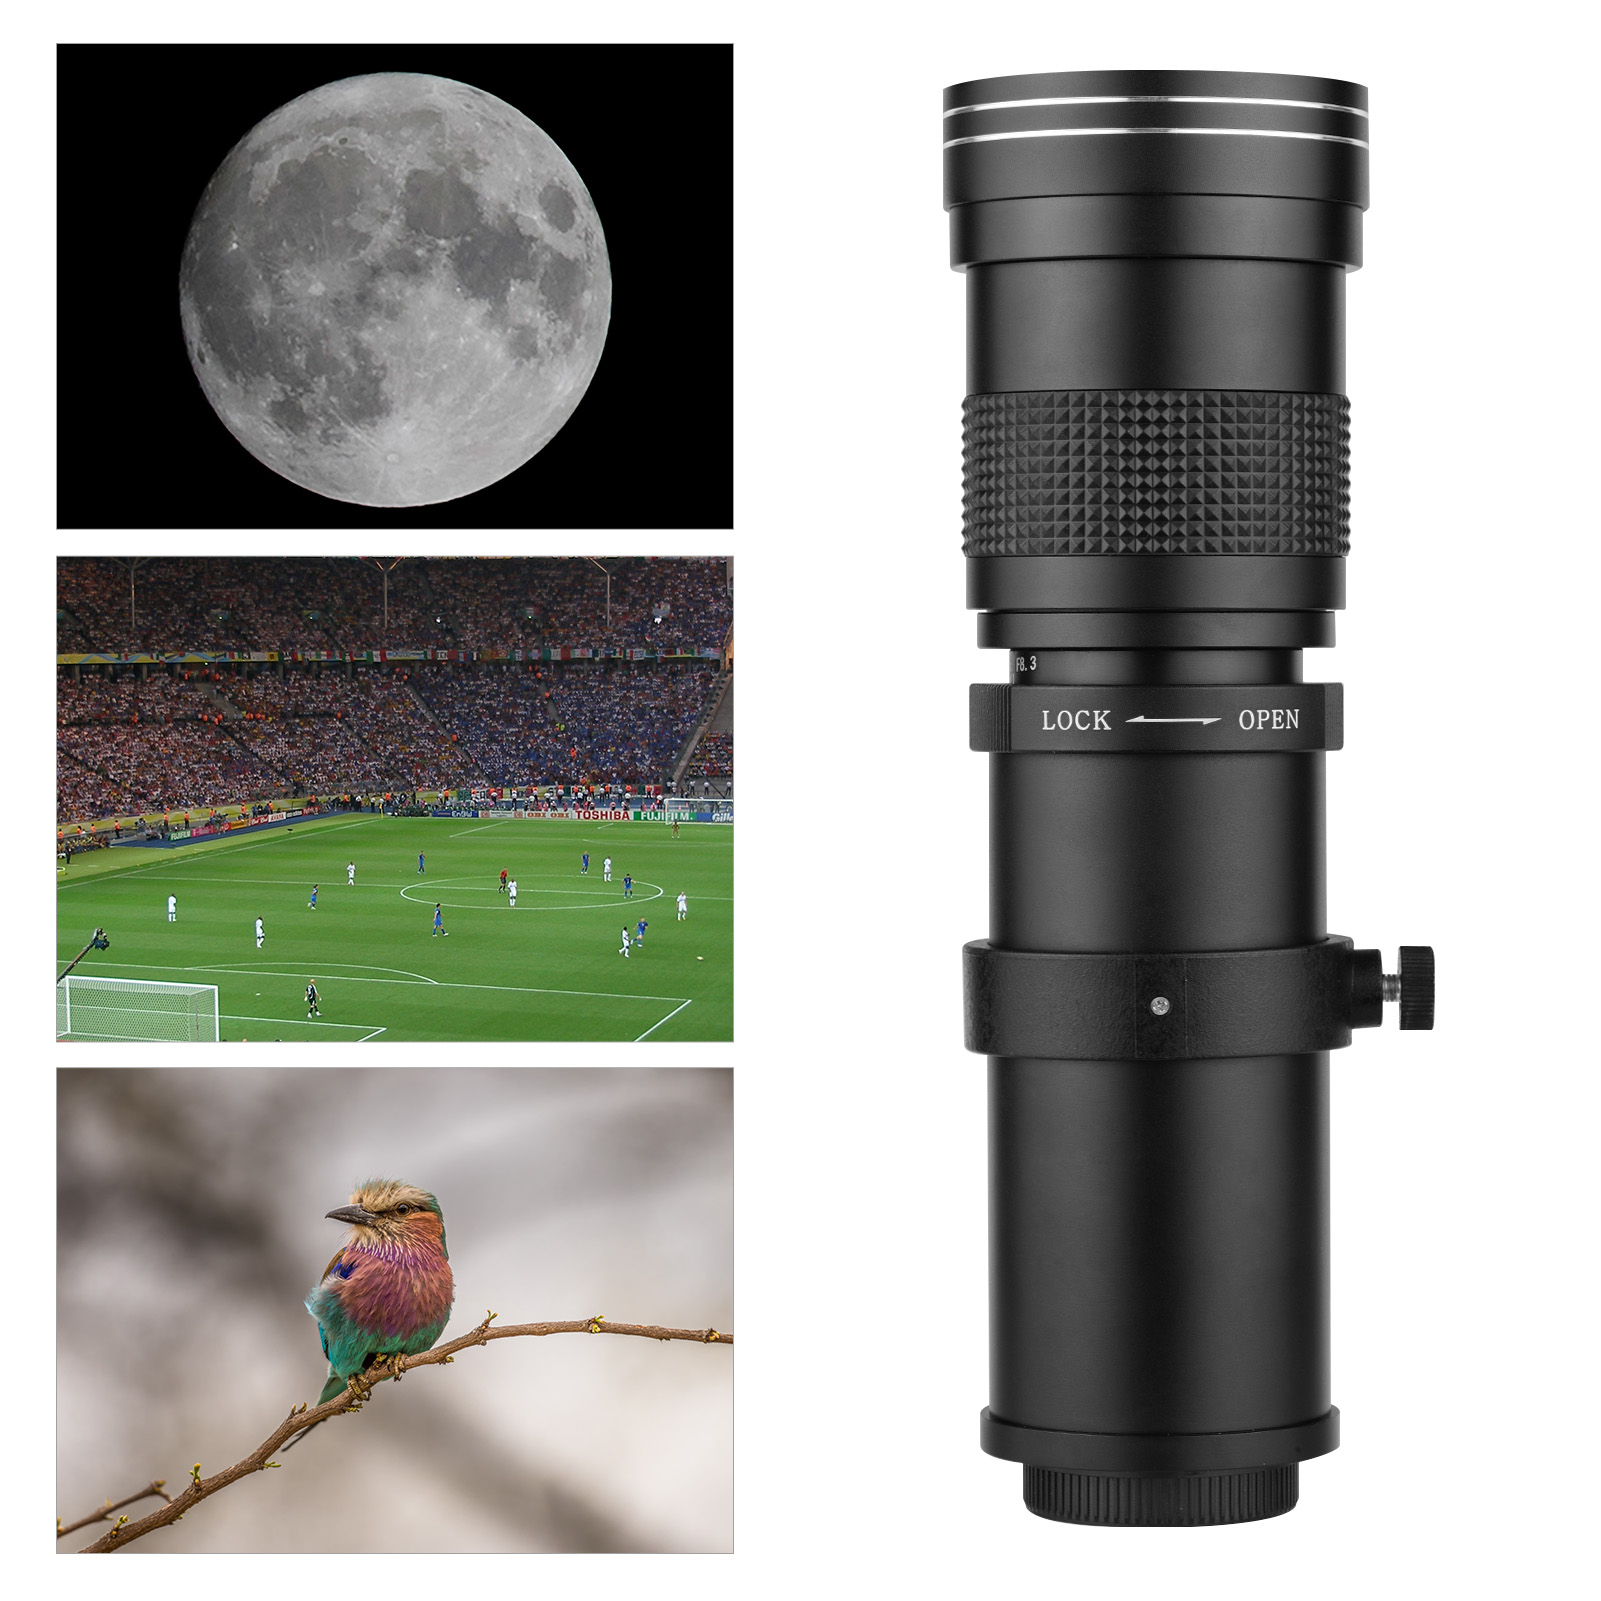 Camera MF Super Telephoto Zoom Lens F/8.3-16 420-800mm T Mount with1/4 Thread for Canon Nikon Sony Fujifilm Olympus Cameras